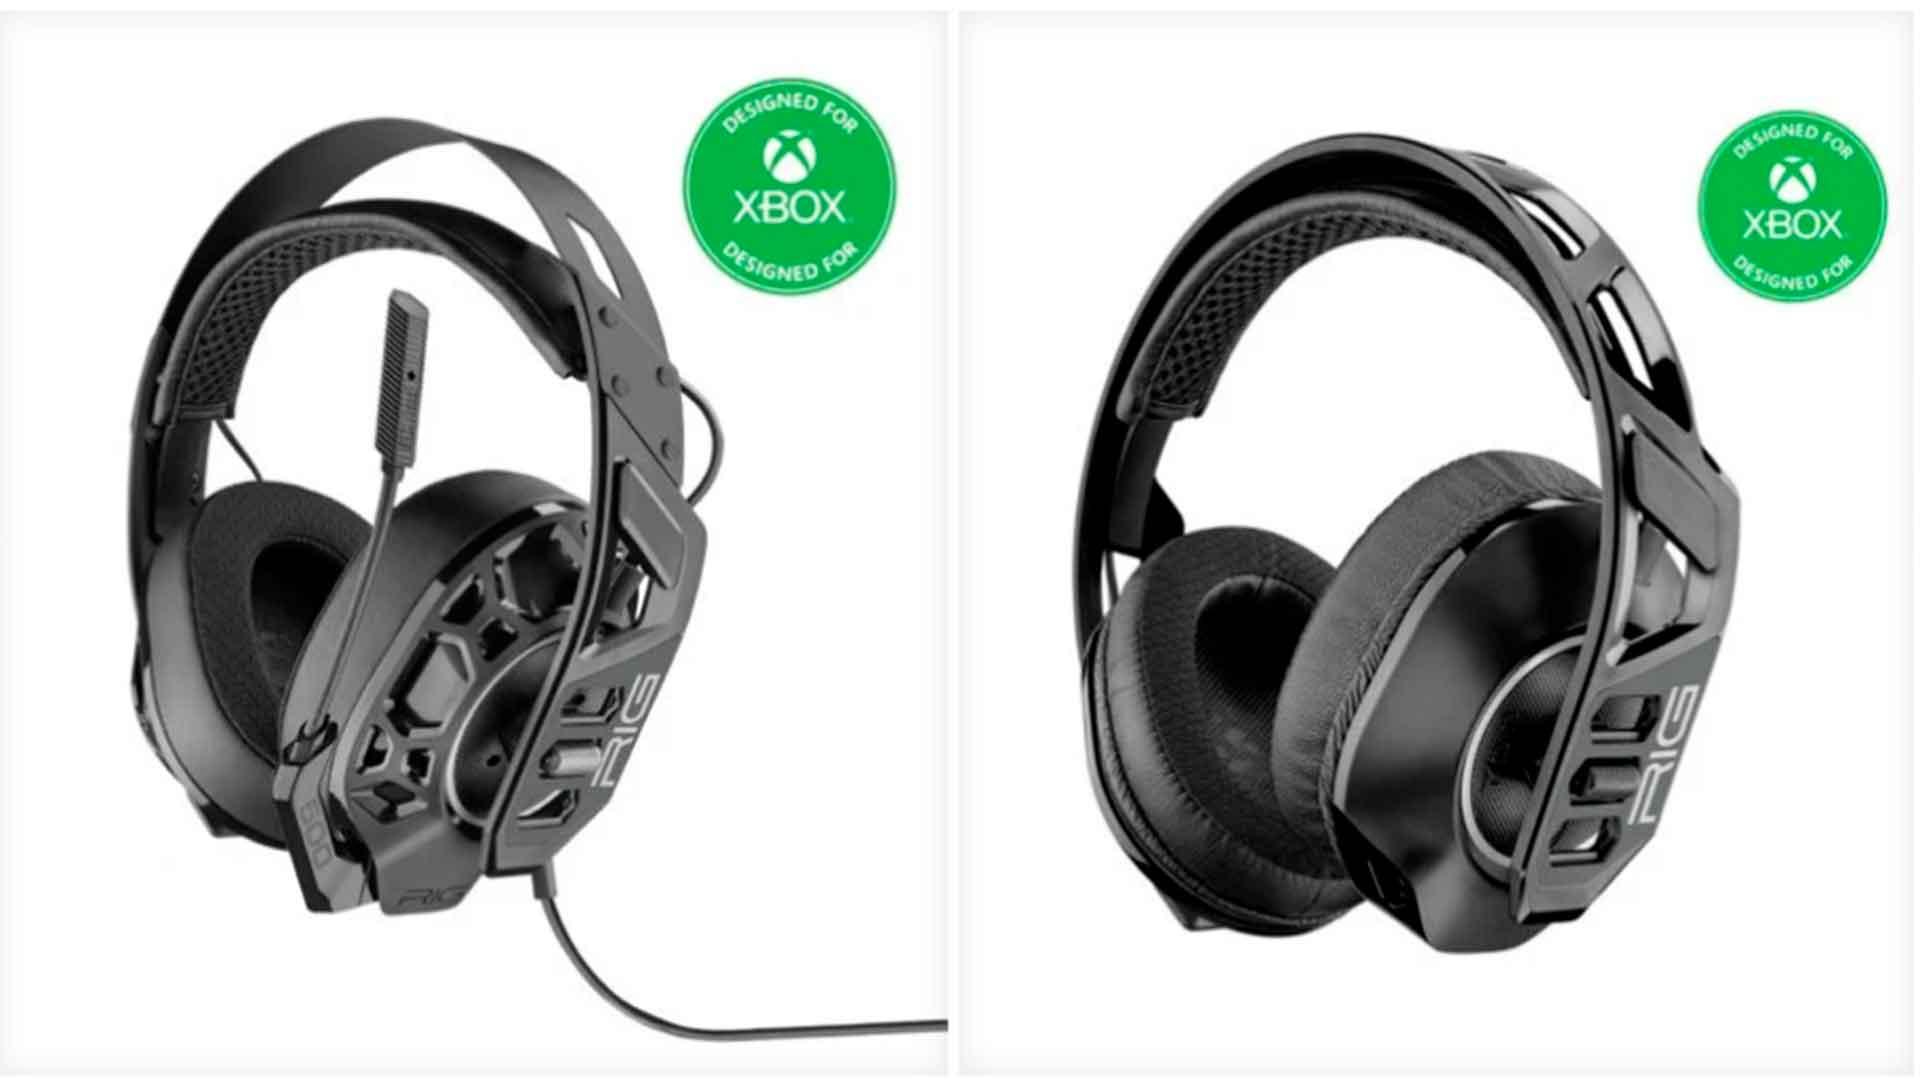 Heatsets Dolby RIG. Xbox, GamersRD